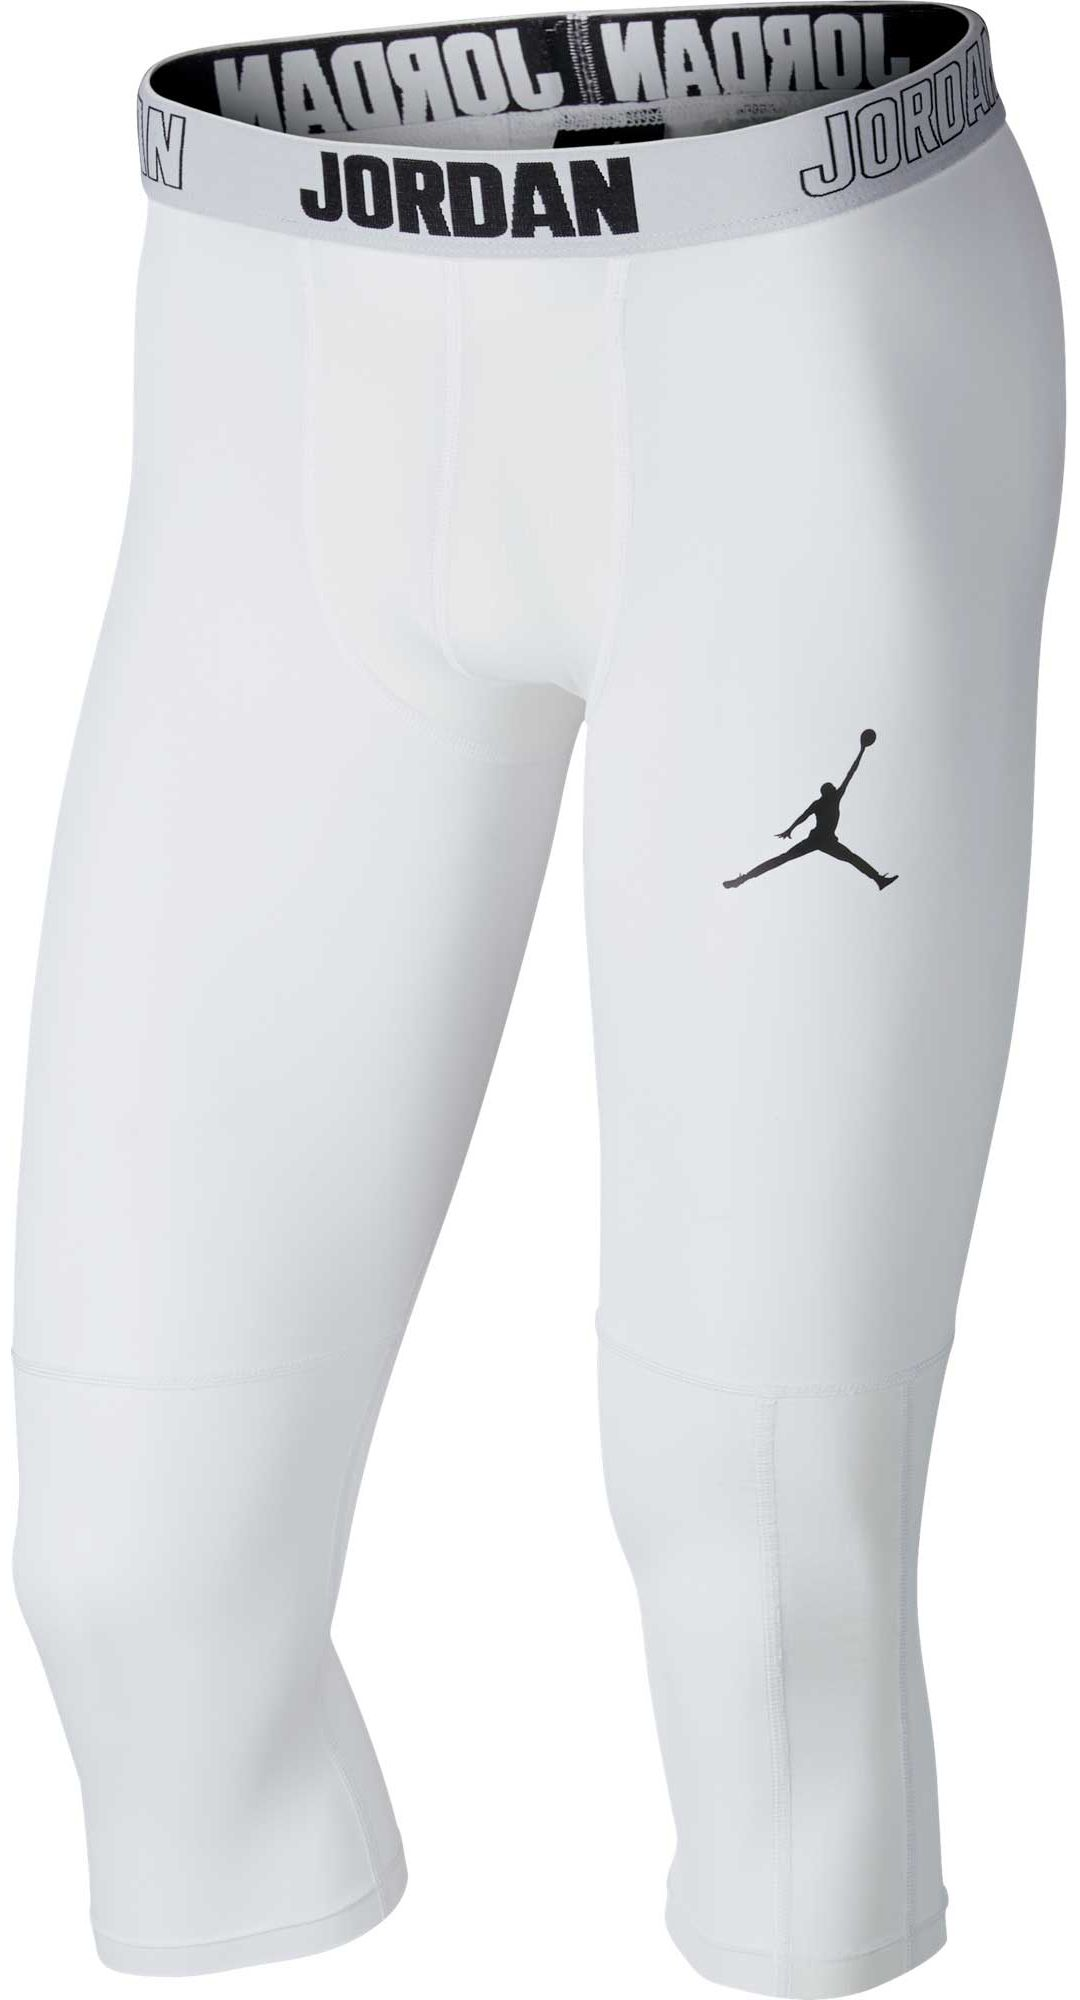 7b1ee3bec1df6 Jordan Men's Dry 23 Alpha 3/4 Training Tights   DICK'S Sporting Goods